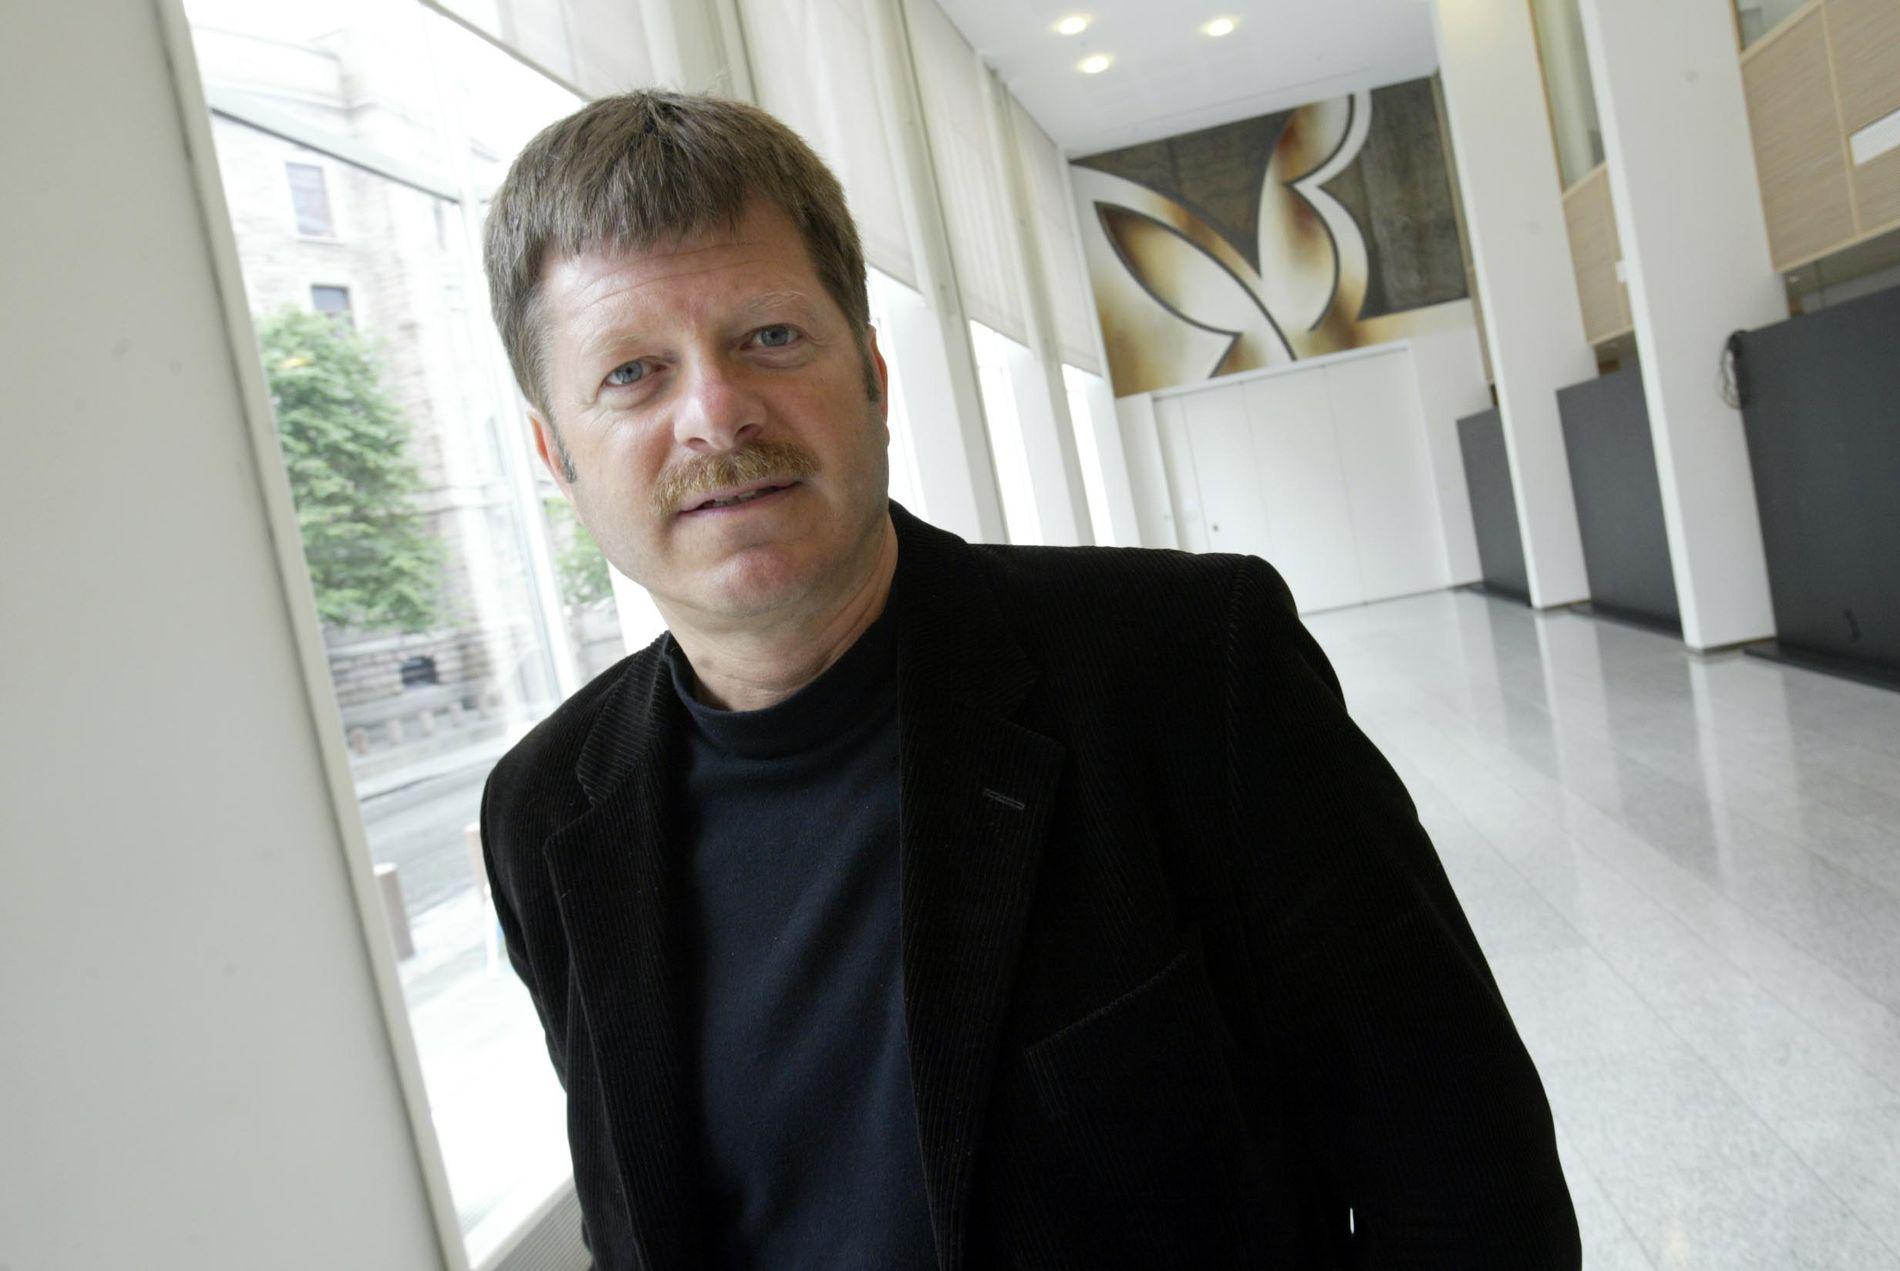 VIL IKKE MER: Odd Anders With fra den tiden han var nestleder og statssekretær i 2003.